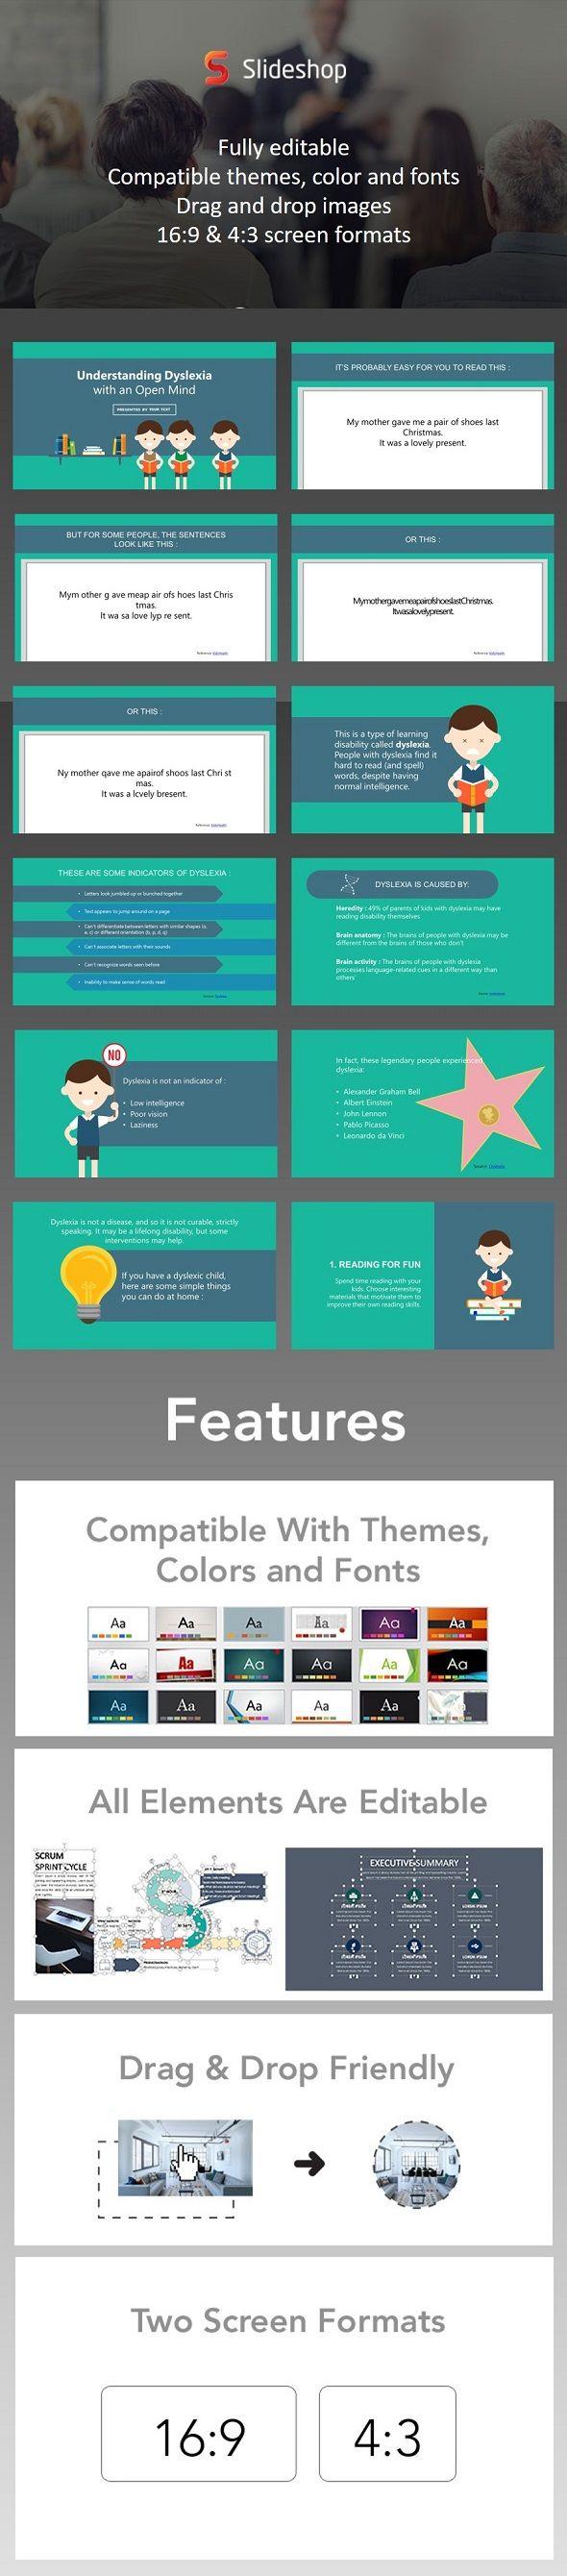 dyslexia | dyslexia, presentation templates and template, Presentation templates